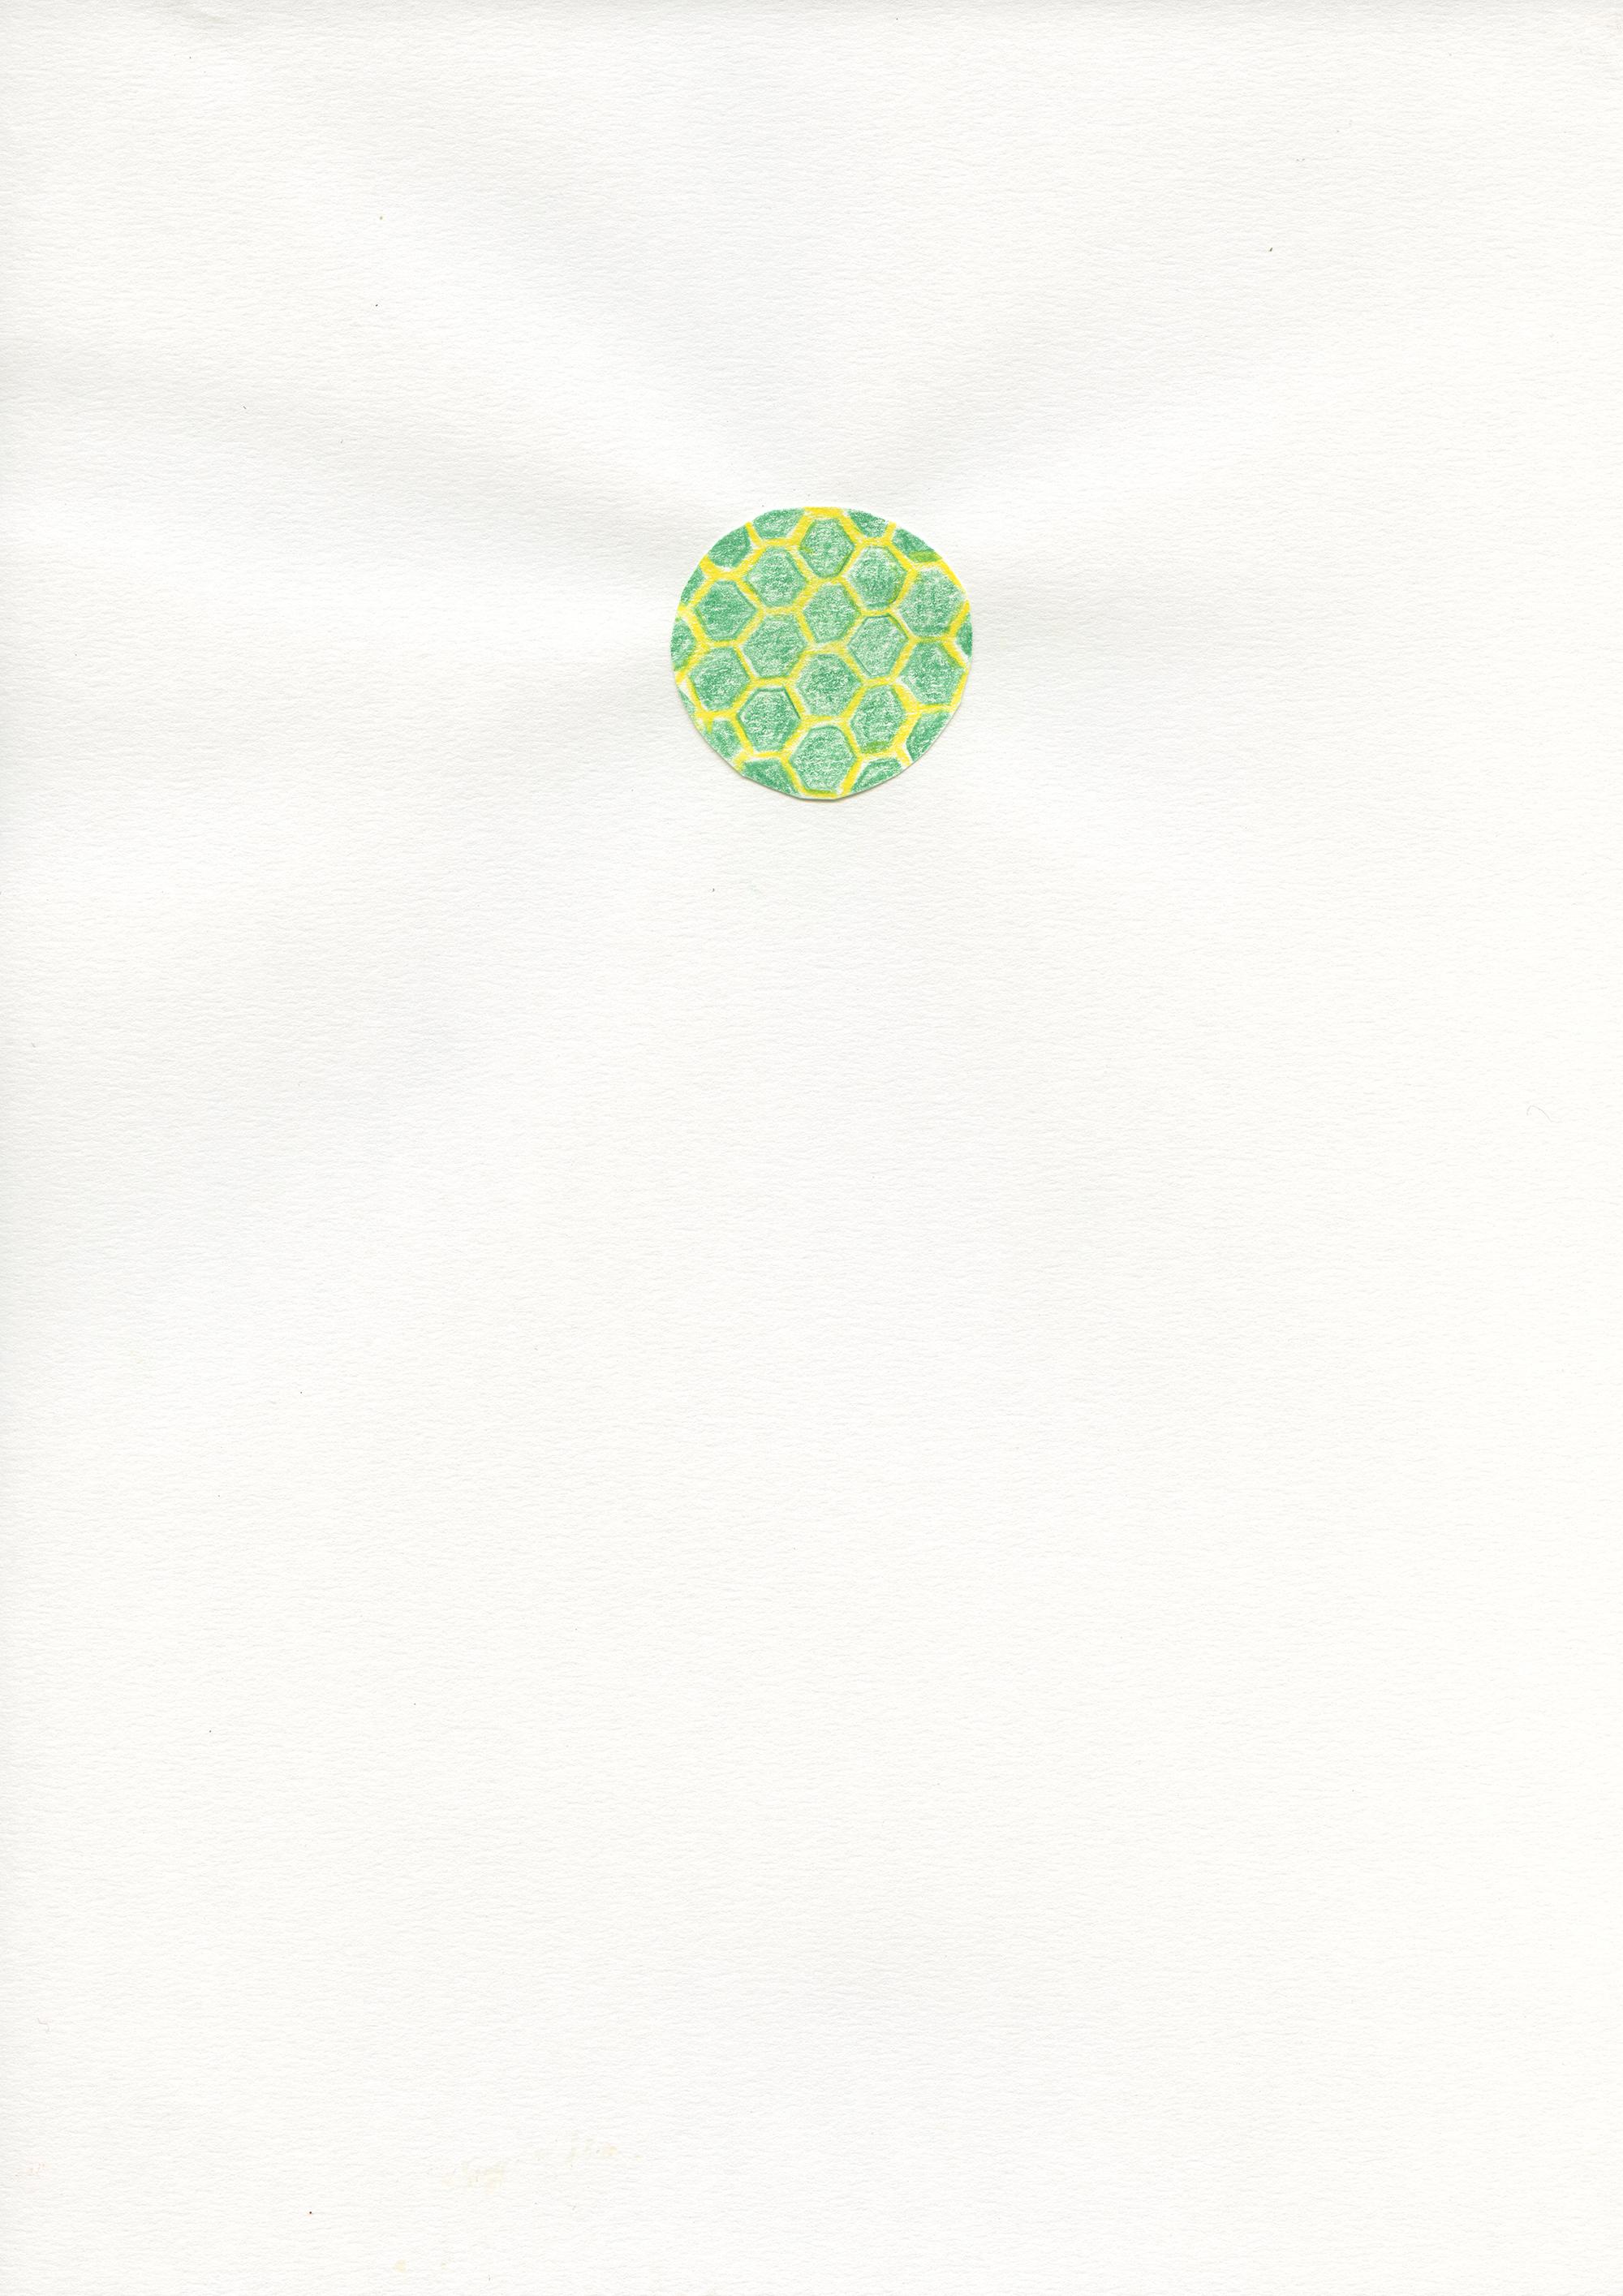 Untitled, 2015, color pencil on paper, 21 x 29,7 cm